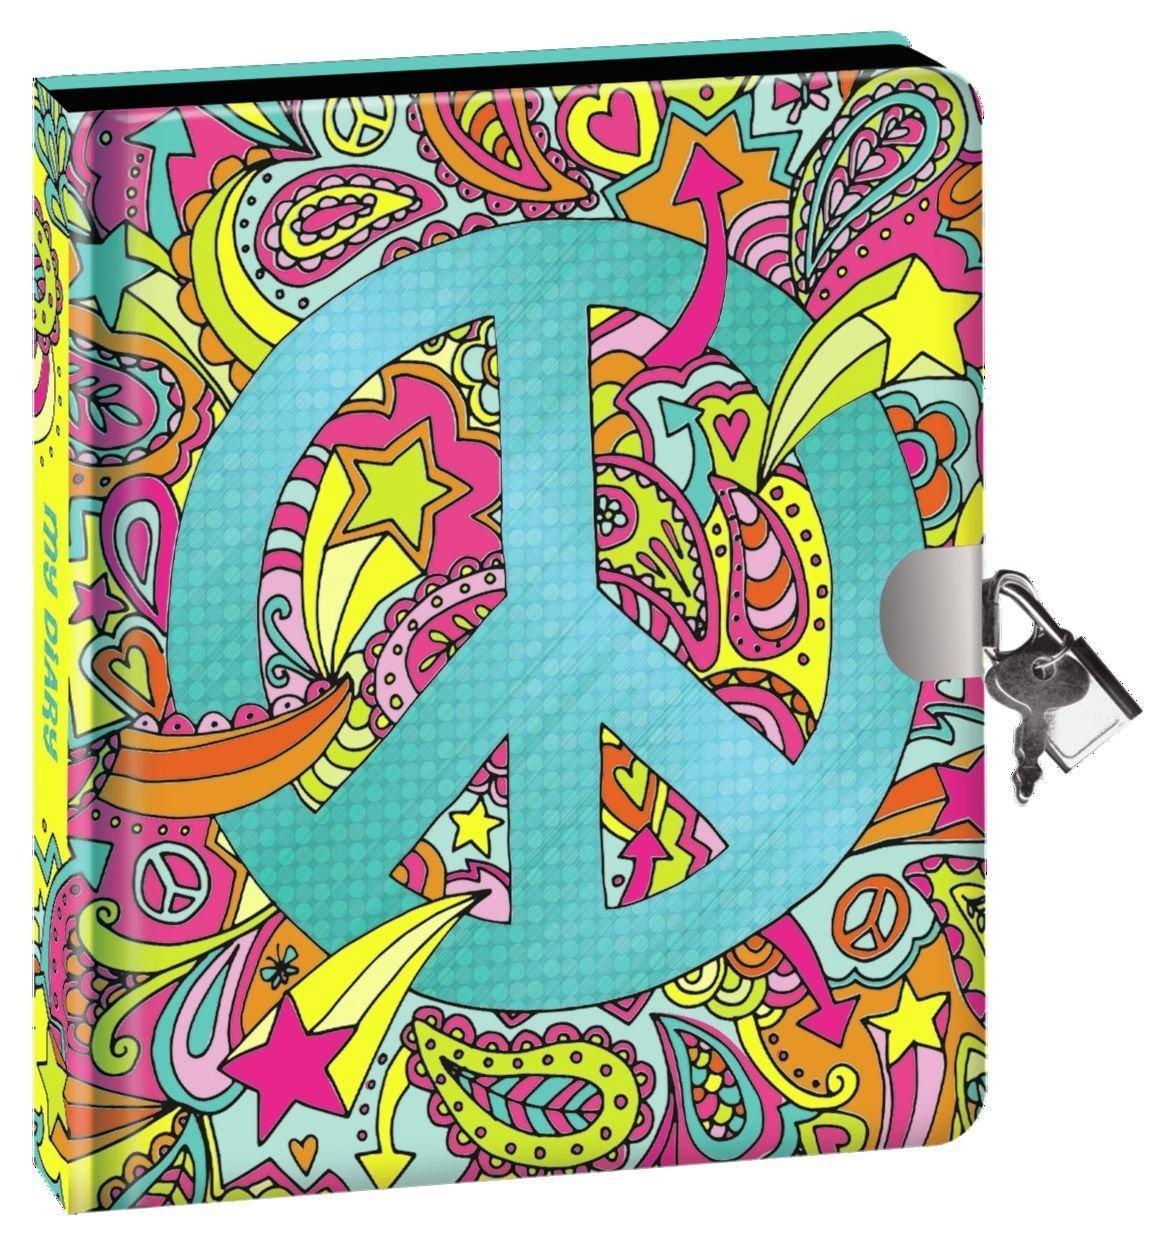 PEACE SIGN LOCK & KEY DIARY